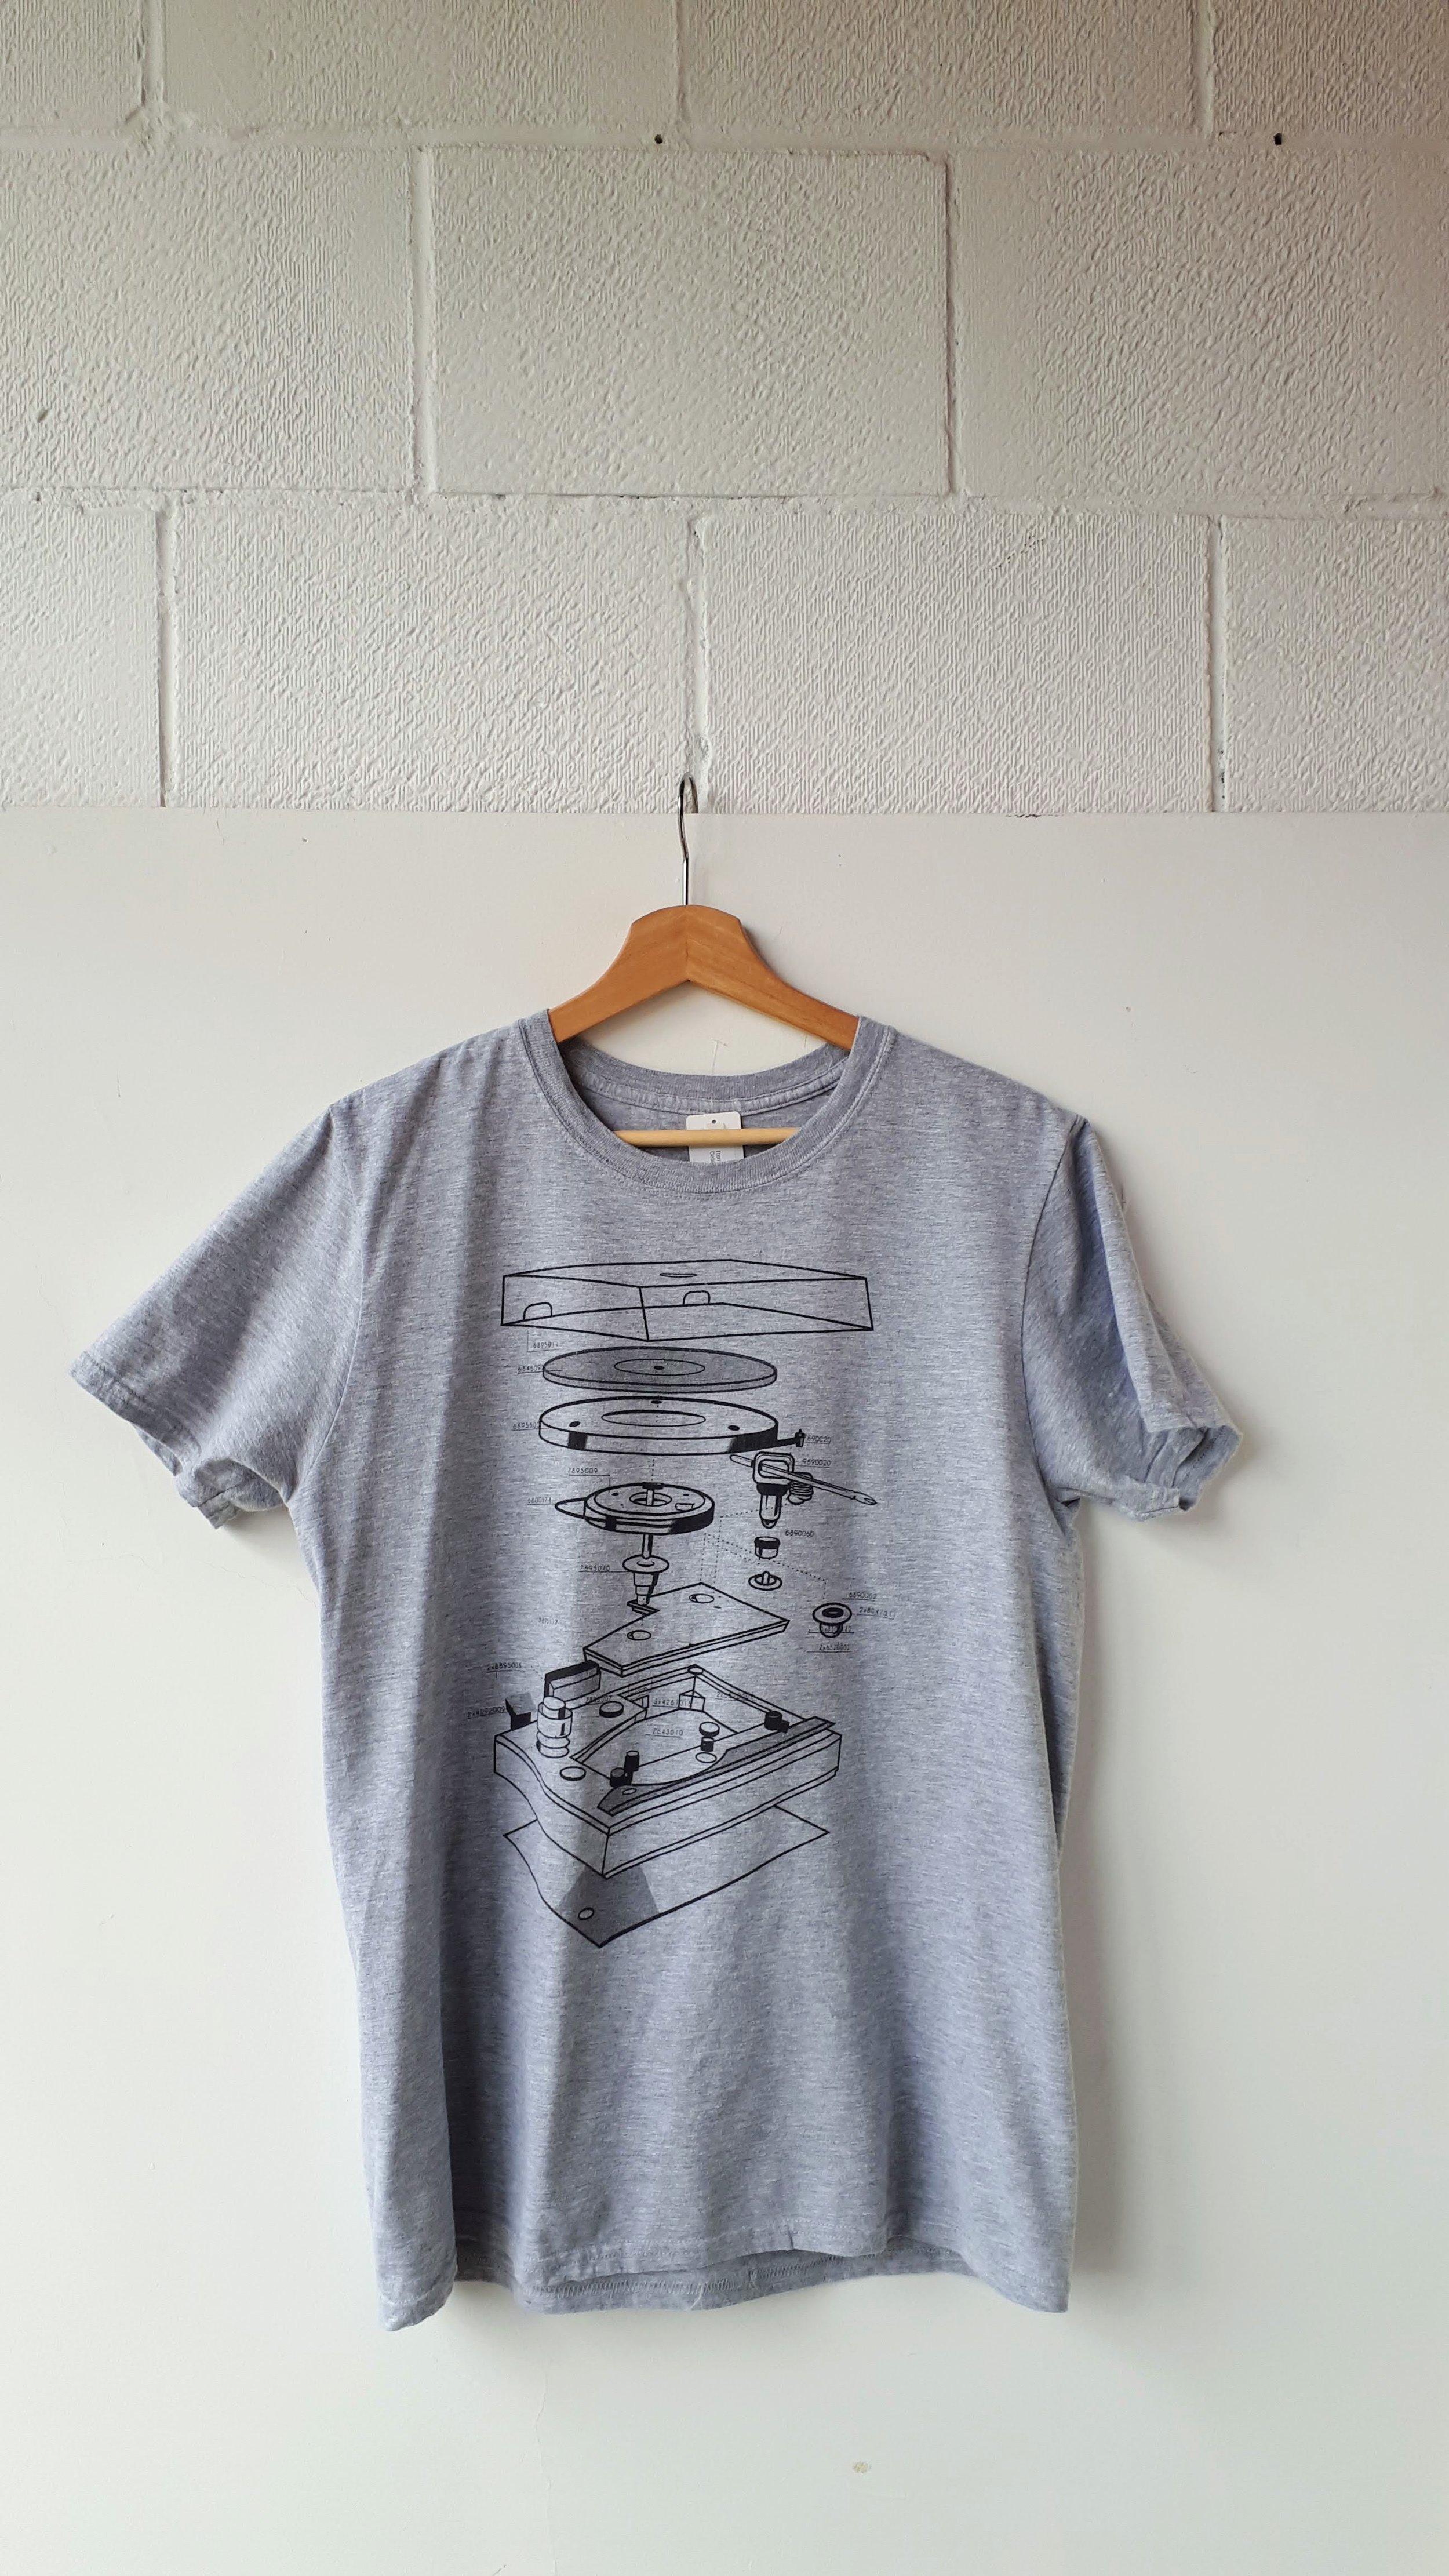 Turntable shirt; Men's size M, $20